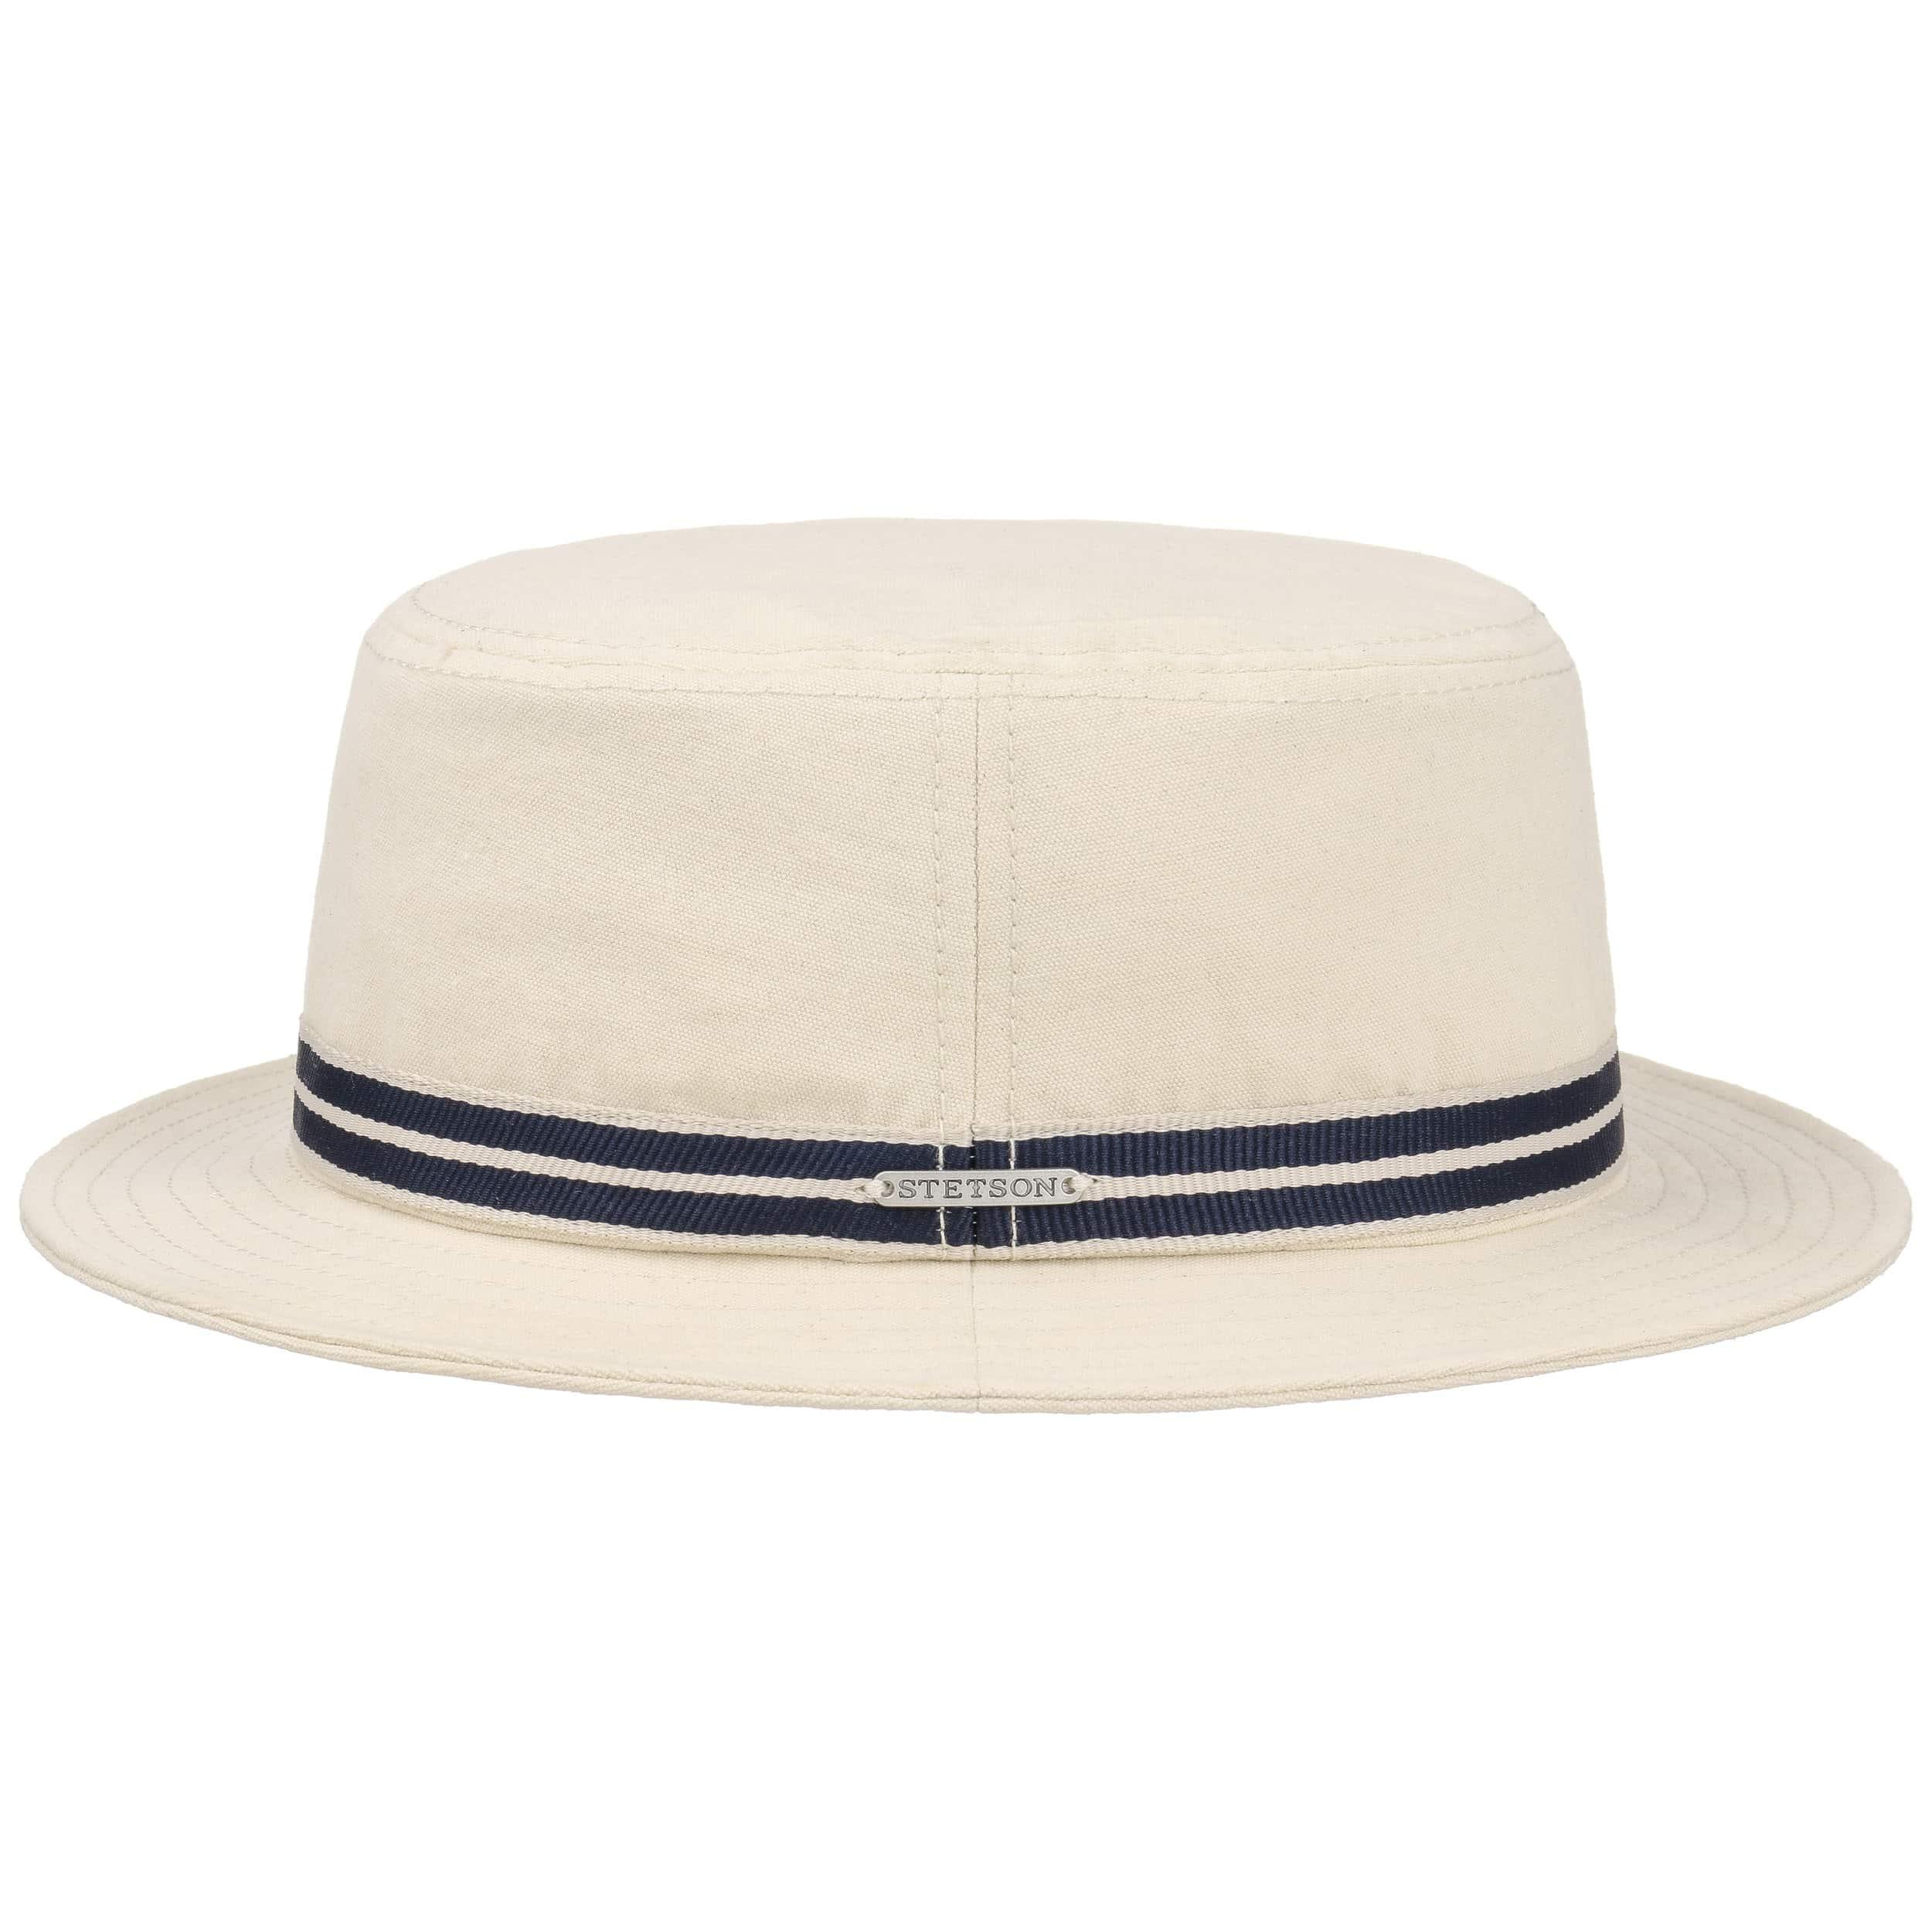 ... Canvas Bucket Hat by Stetson - beige 4 ... 891cf0e4e0e